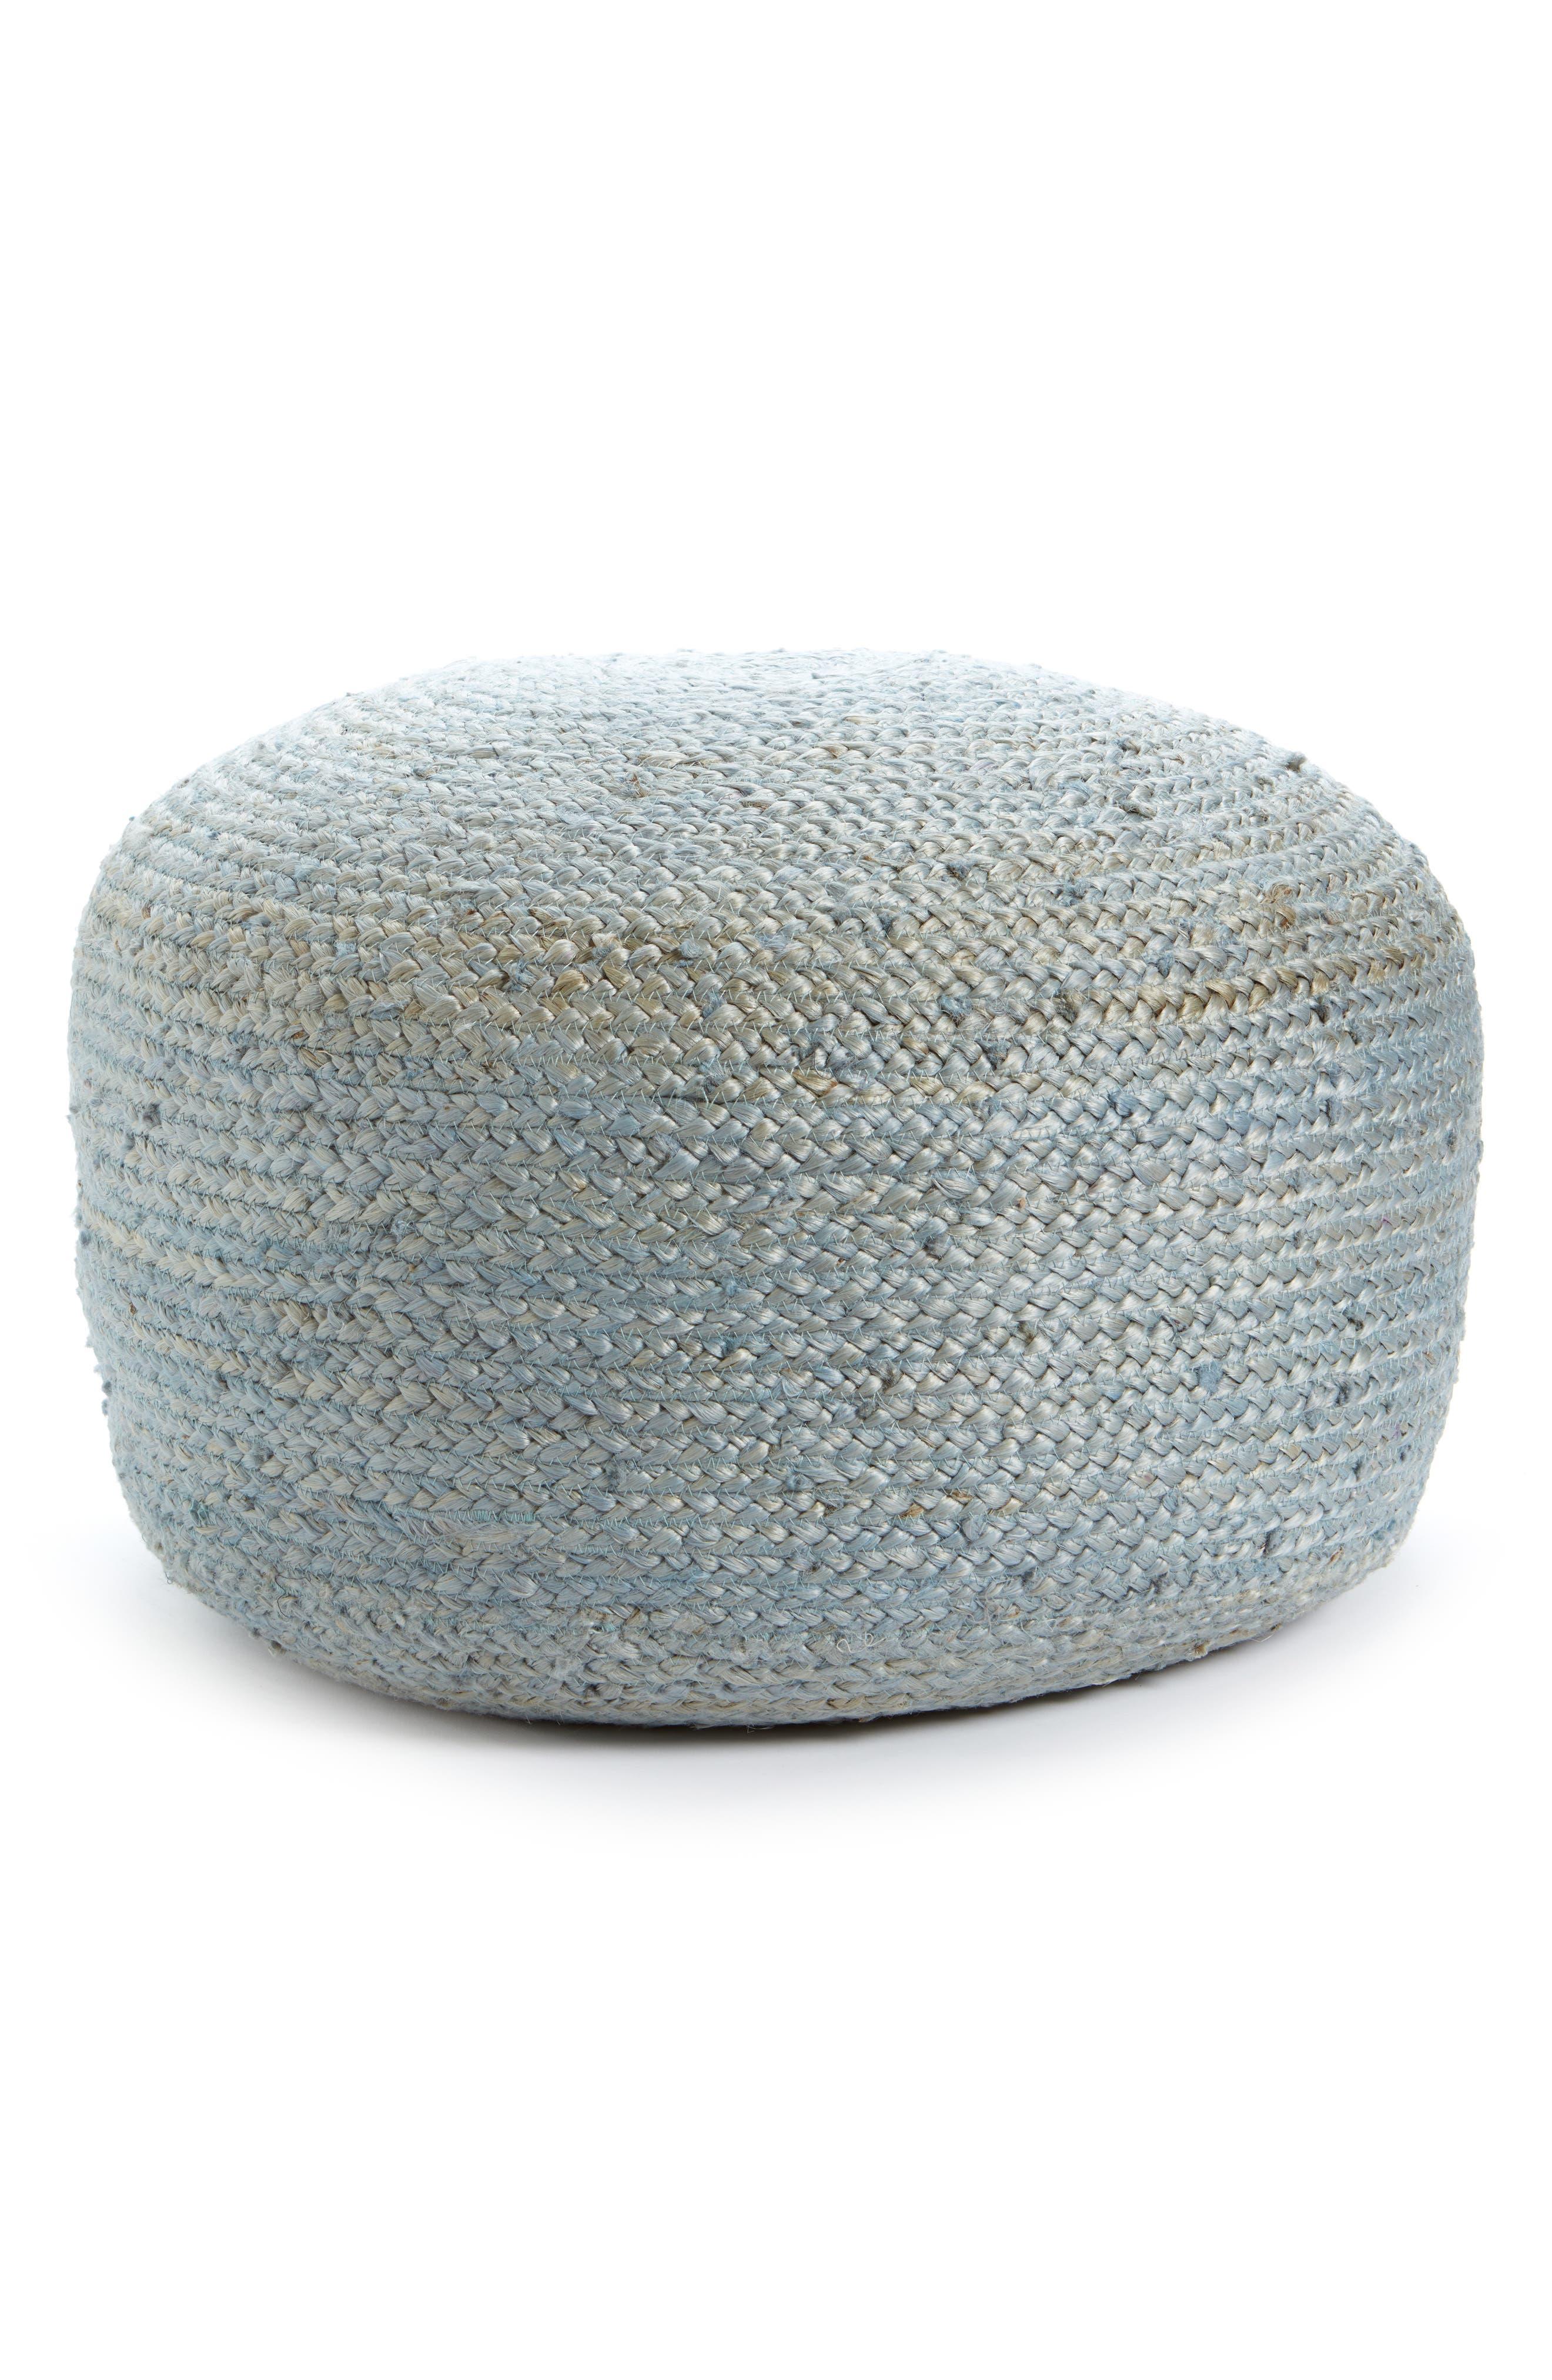 Indoor/Outdoor Jute Pouf,                         Main,                         color, Blue Drizzle